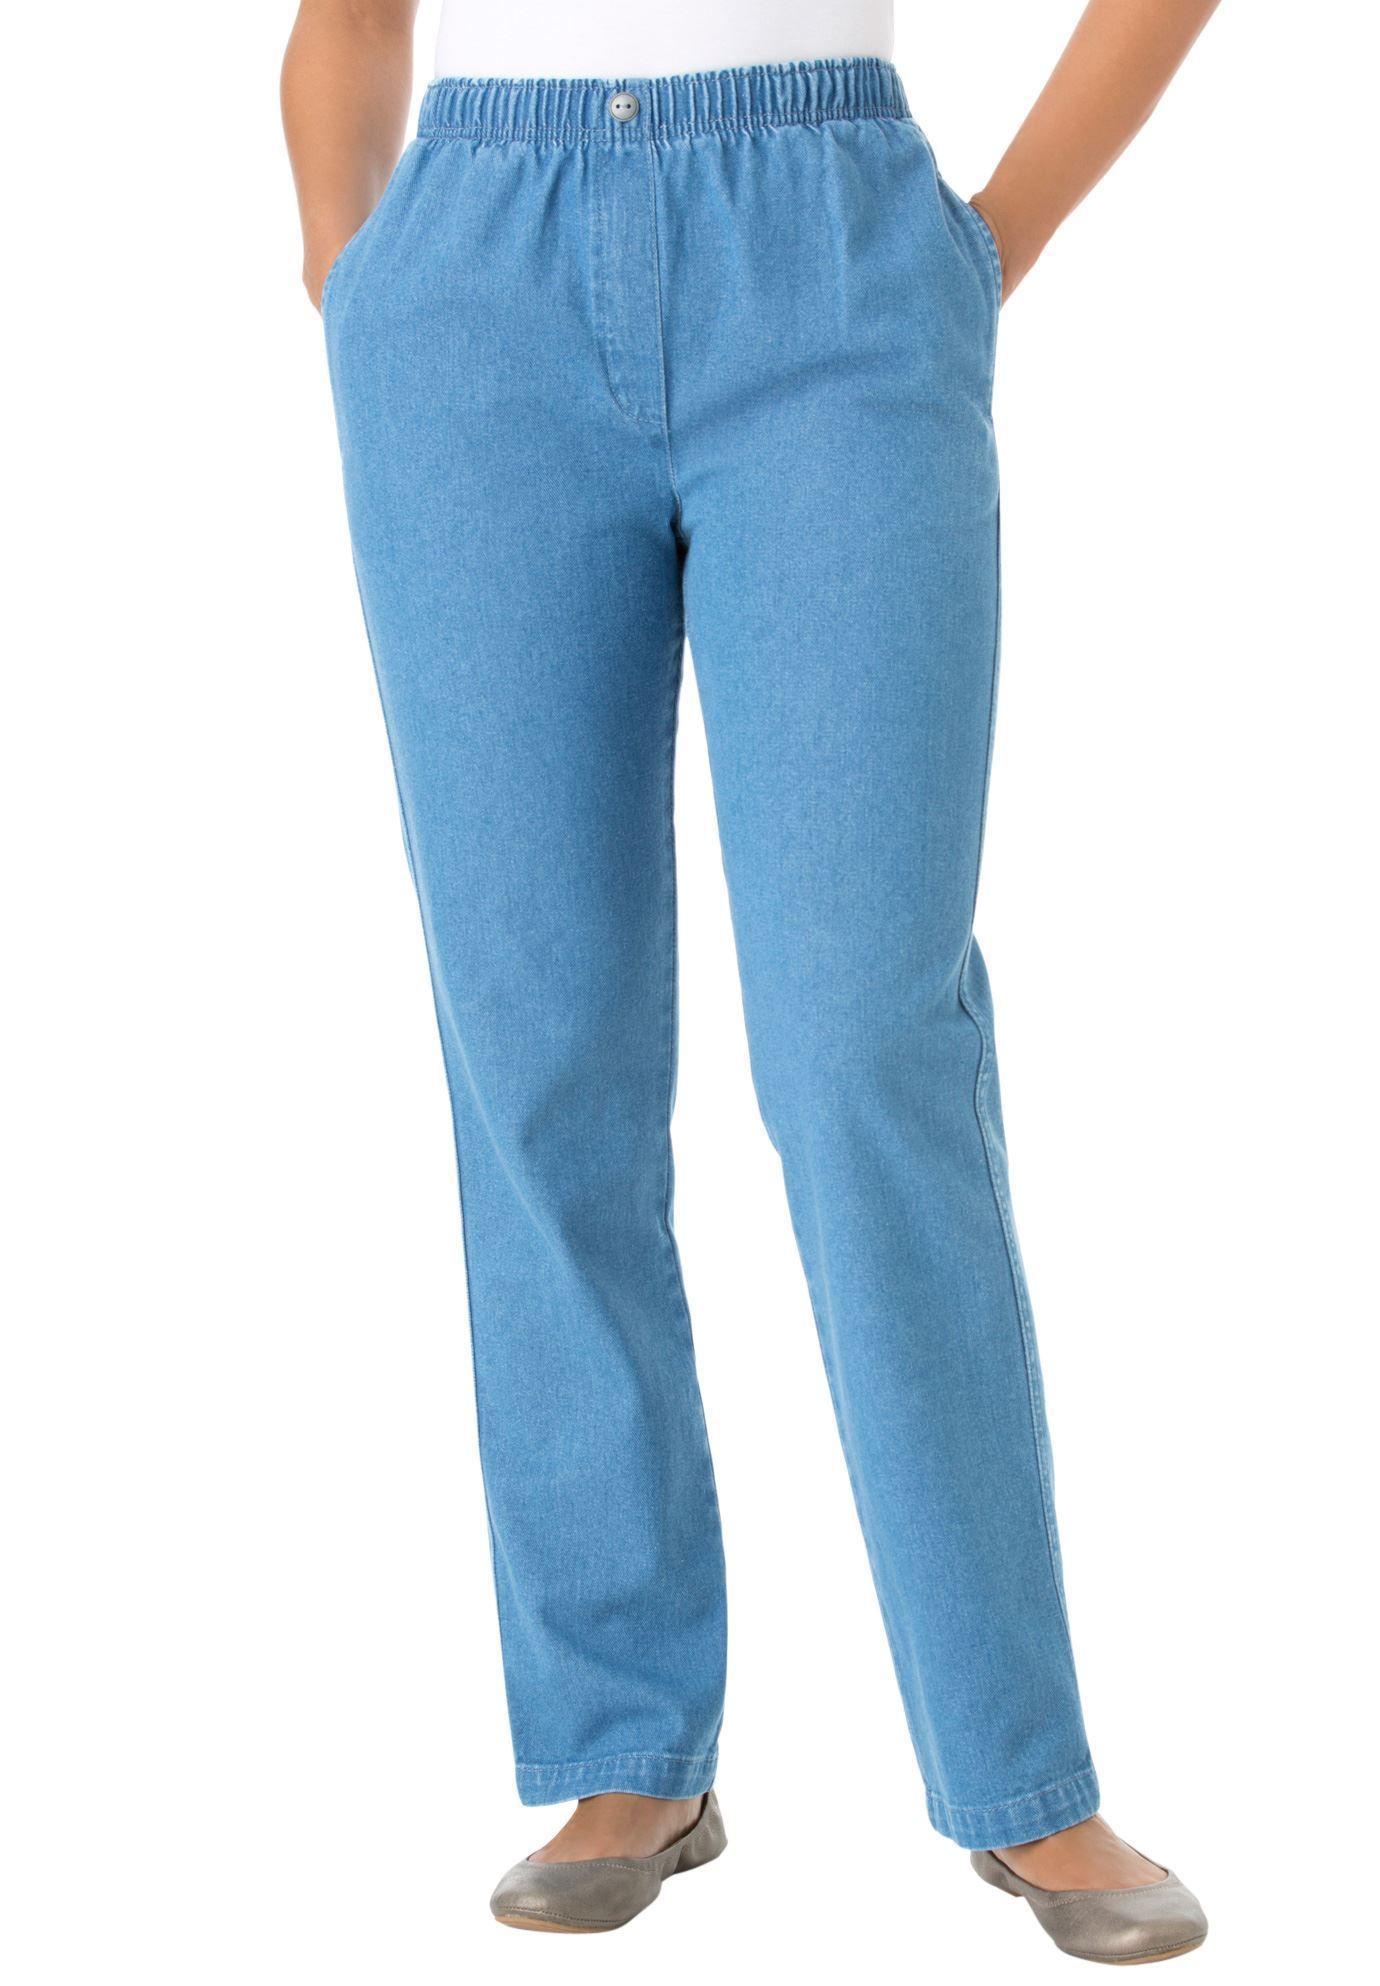 1ebe9dae42f Cotton Straight Leg Mockfly Jean - Women s Plus Size Clothing ...